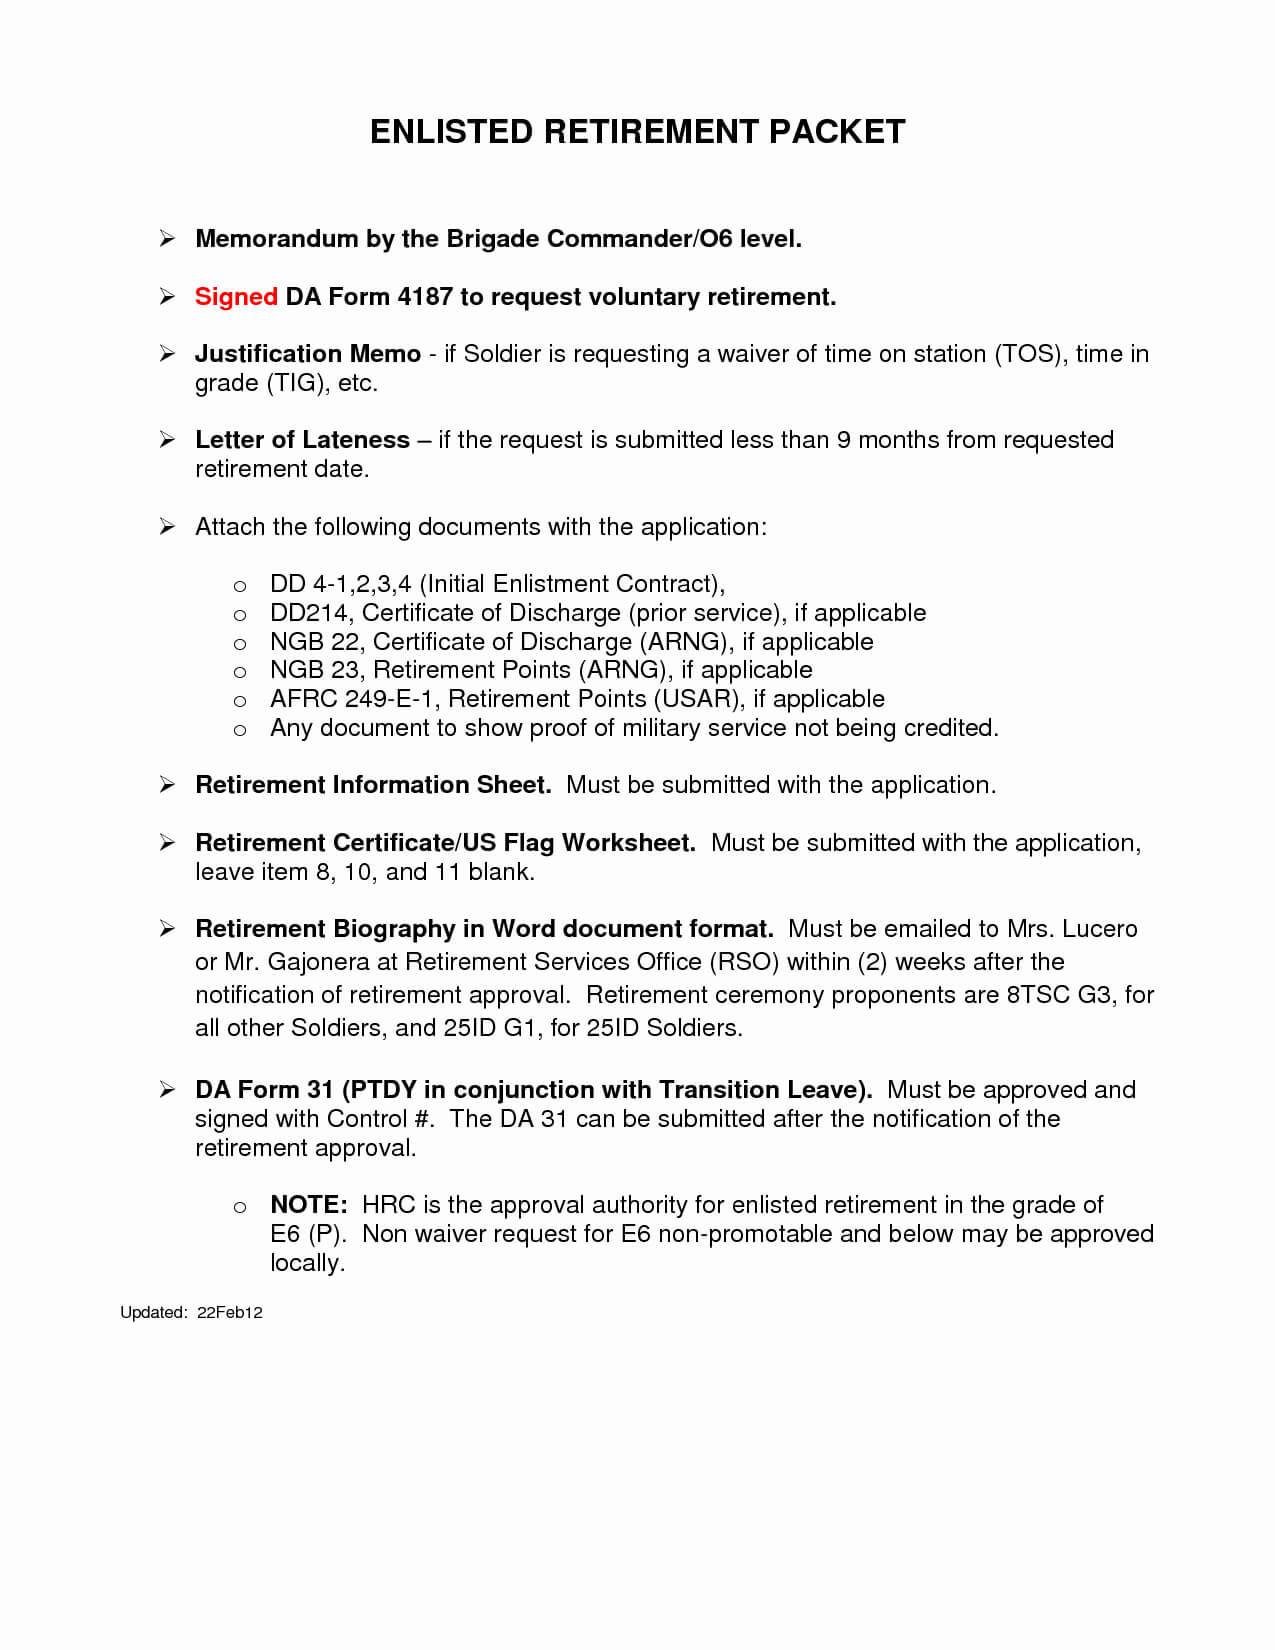 Memorandum For Record Army Template Word Throughout Army Memorandum Template Word